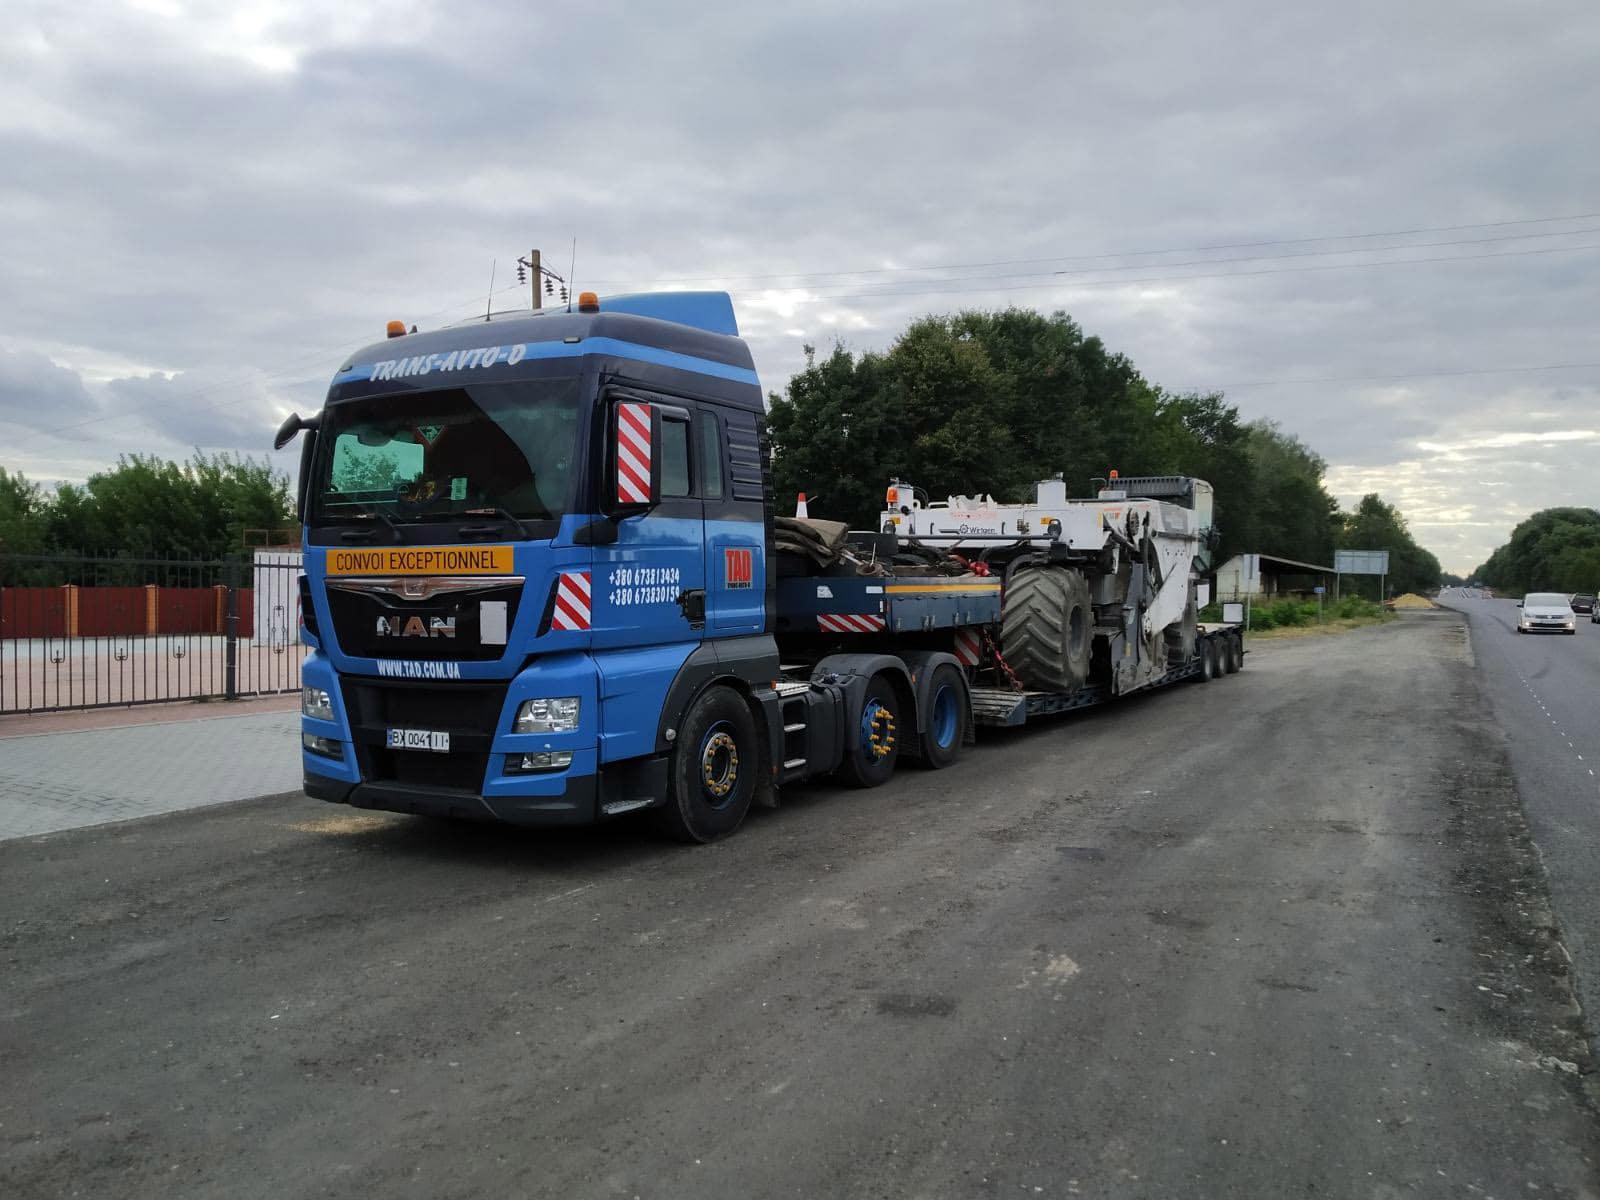 Transportation of a Wirtgen asphalt recycler. Dimensions 3.2 mx 3.2 mx 8.8 m